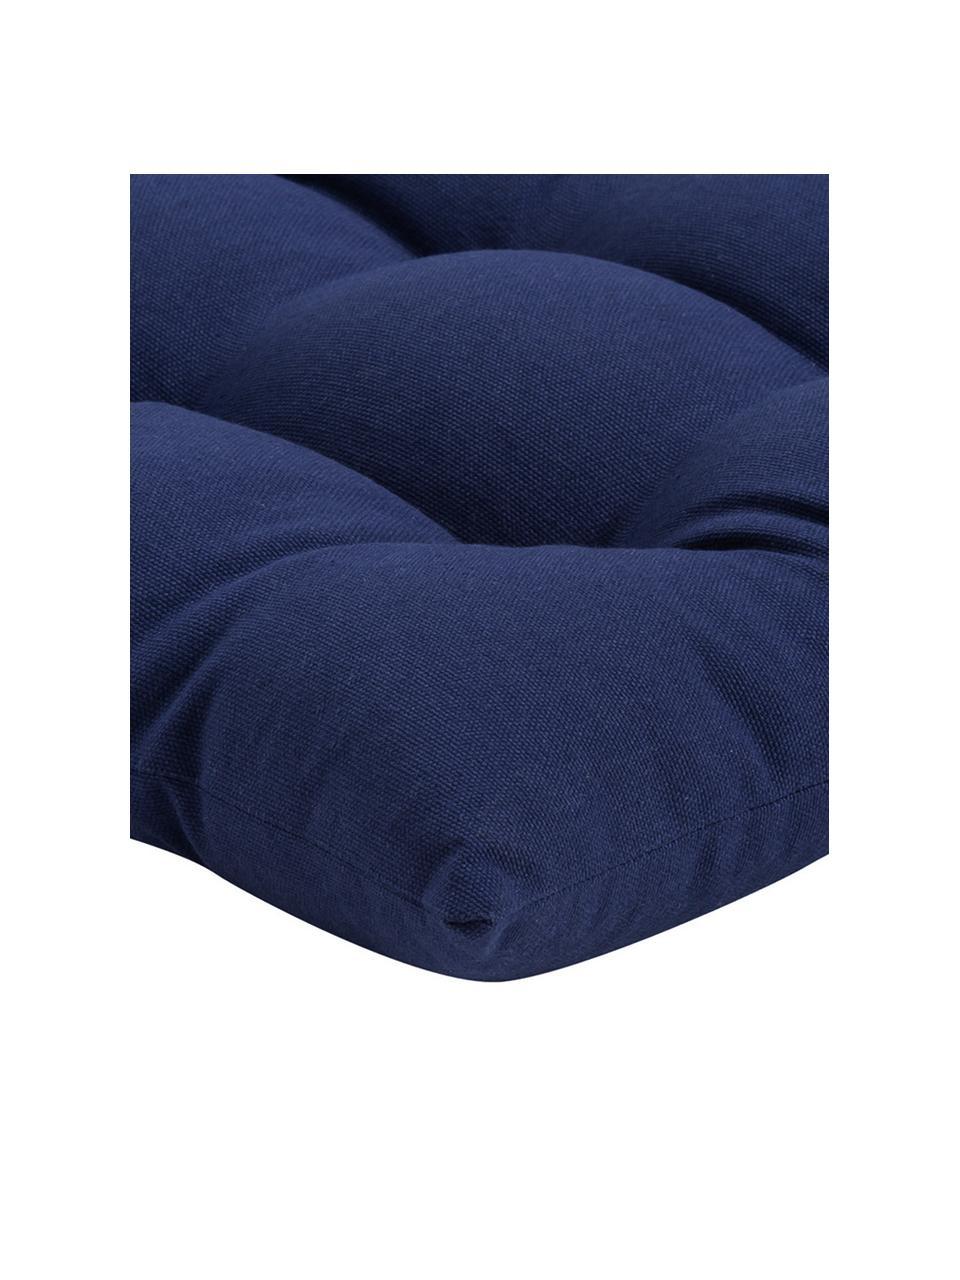 Stoelkussen Ava in marineblauw, Marineblauw, 40 x 40 cm